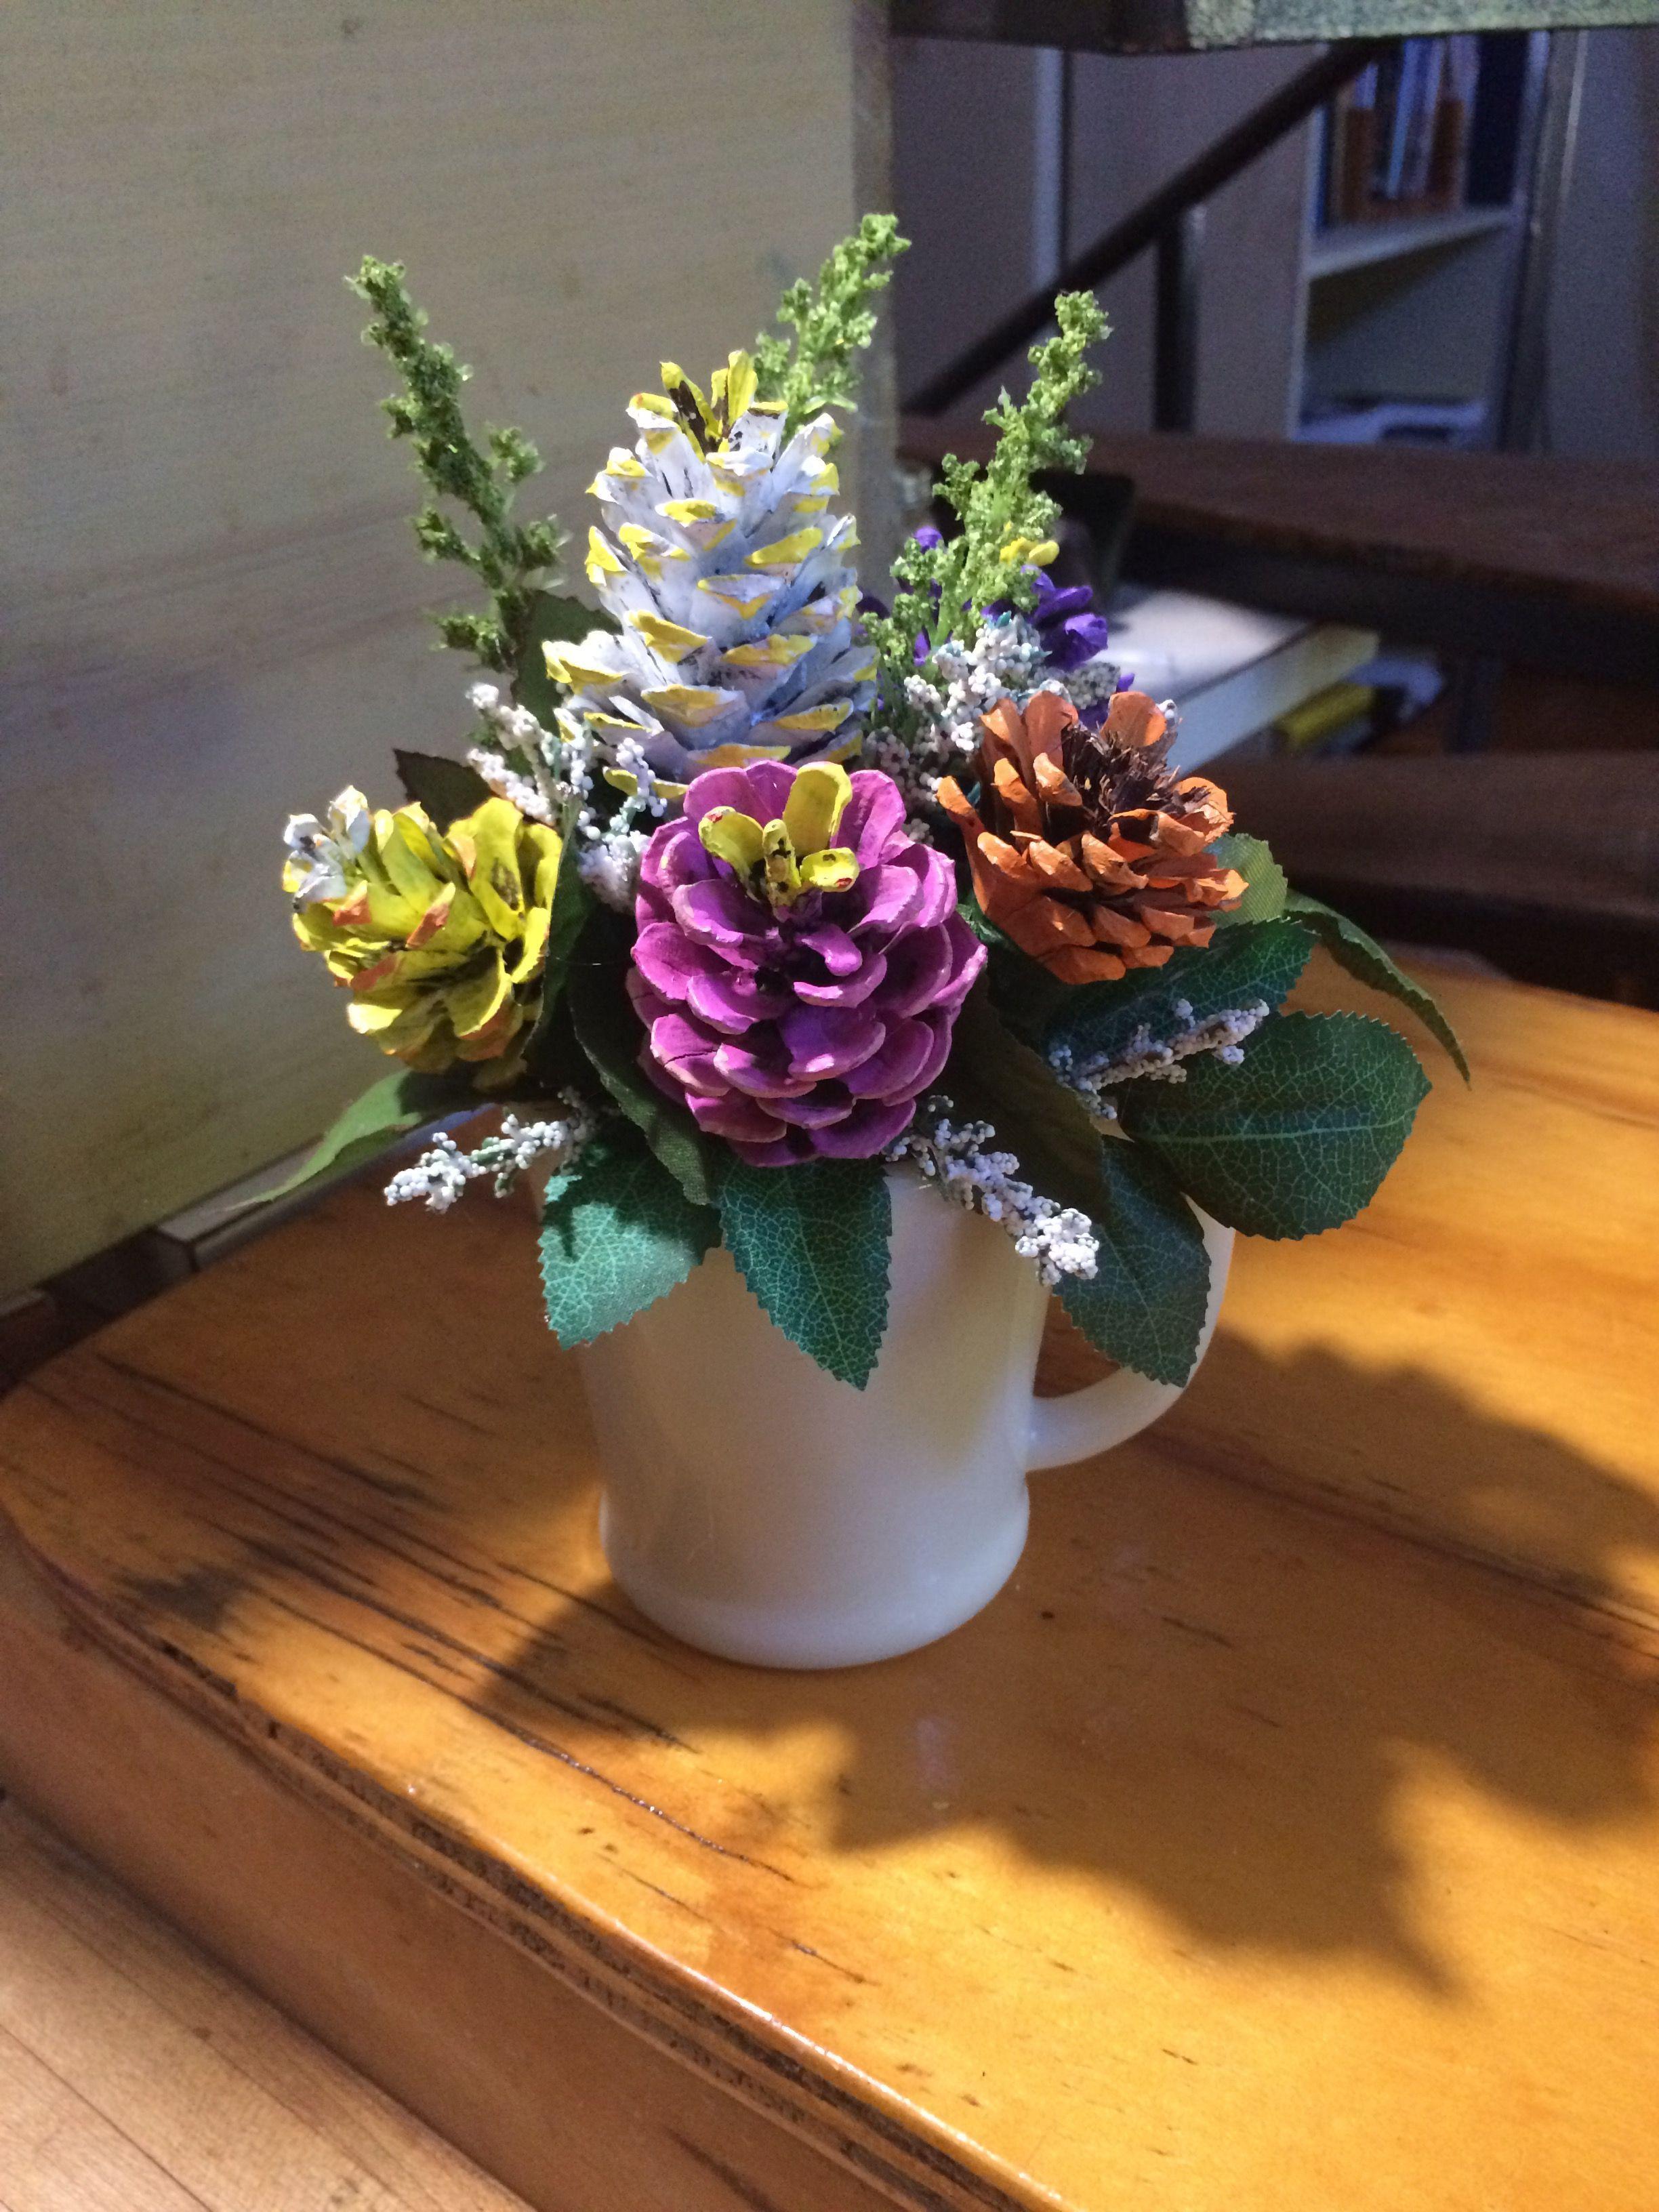 Pinecone Flower Arrangement By Cat Kreativ Hobbi Fenyotoboz Dekoracios Otletek